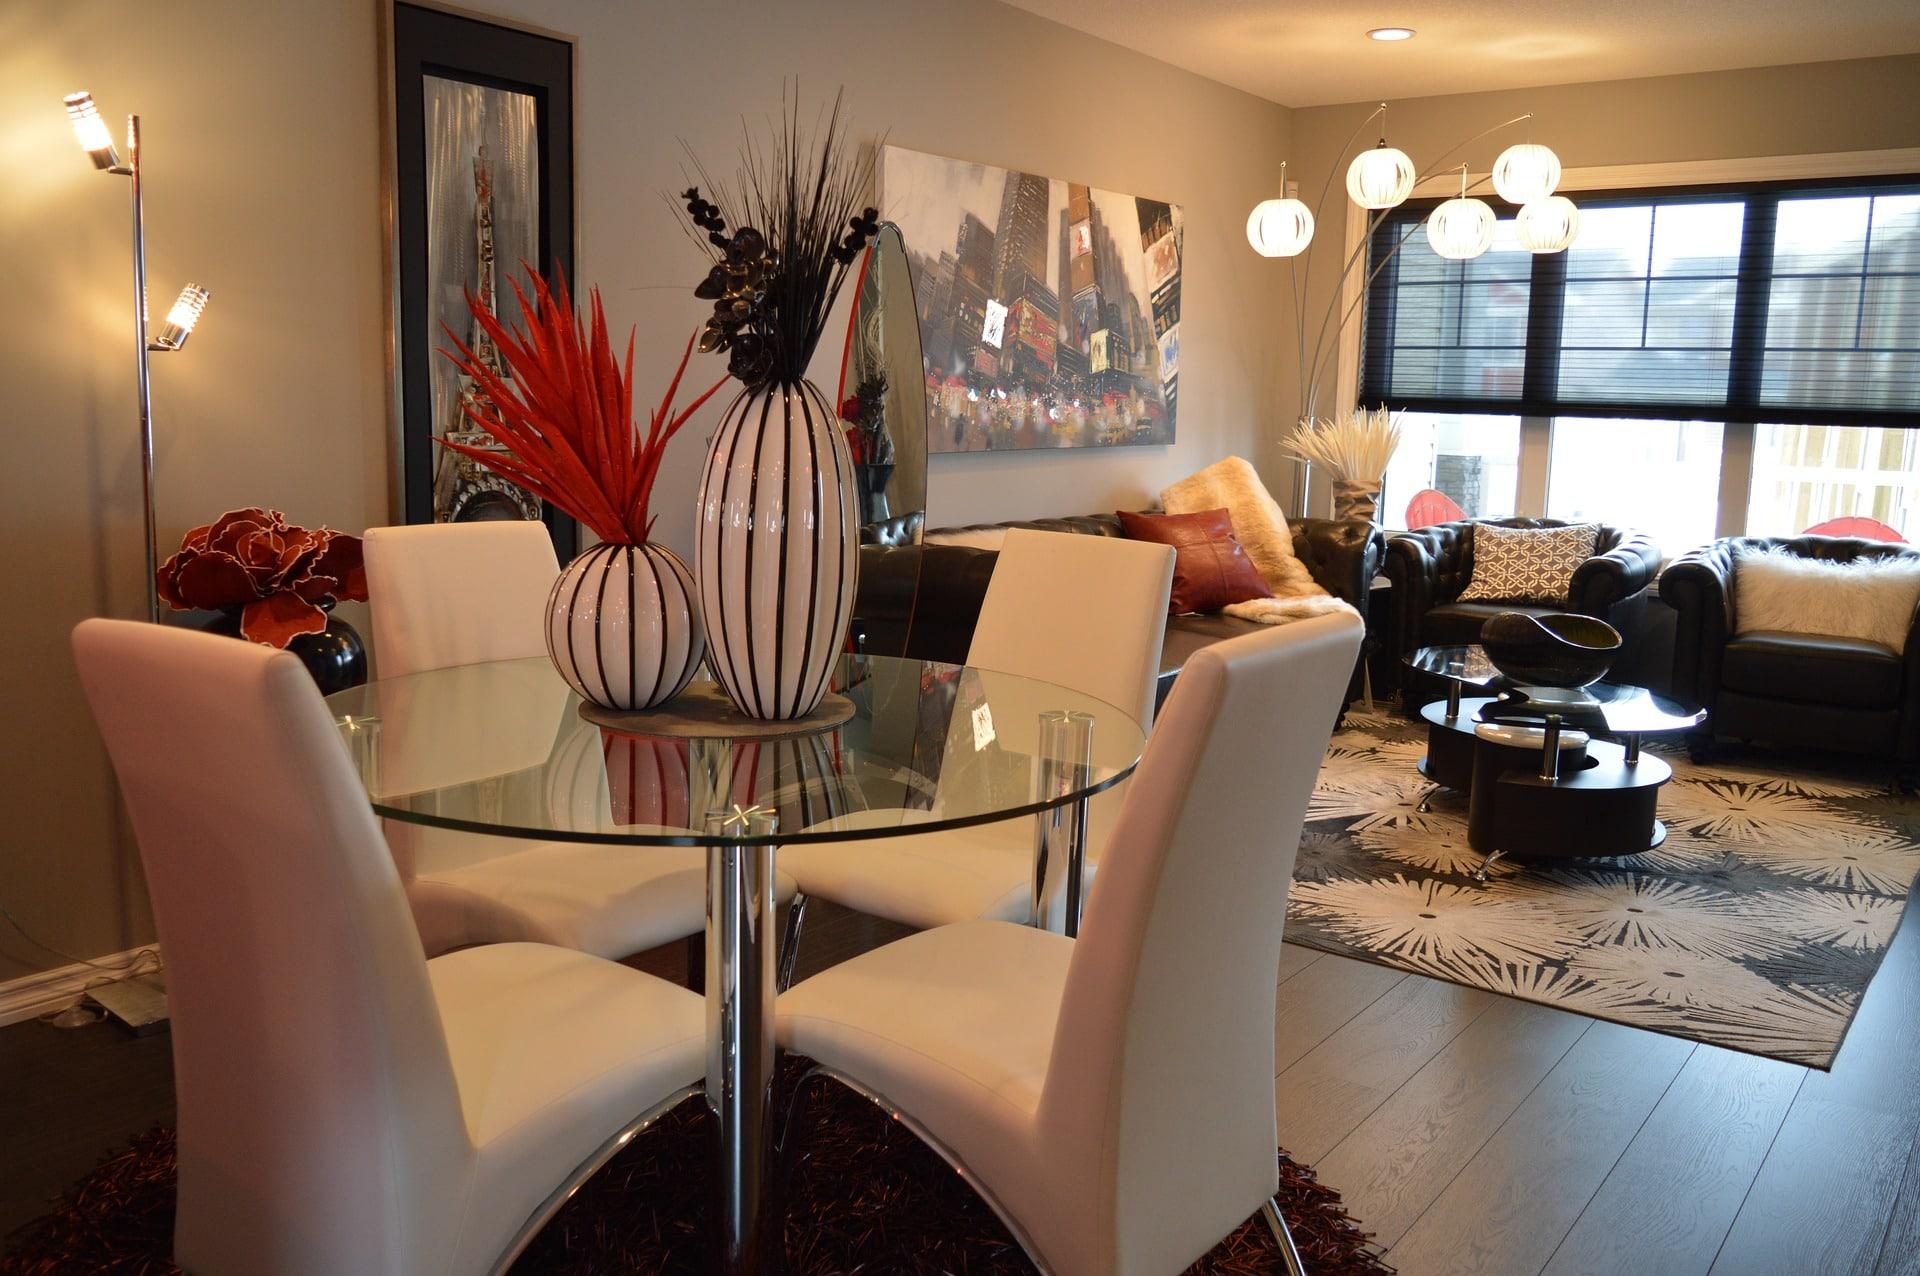 Decoración del hogar: ¿por dónde empezar?